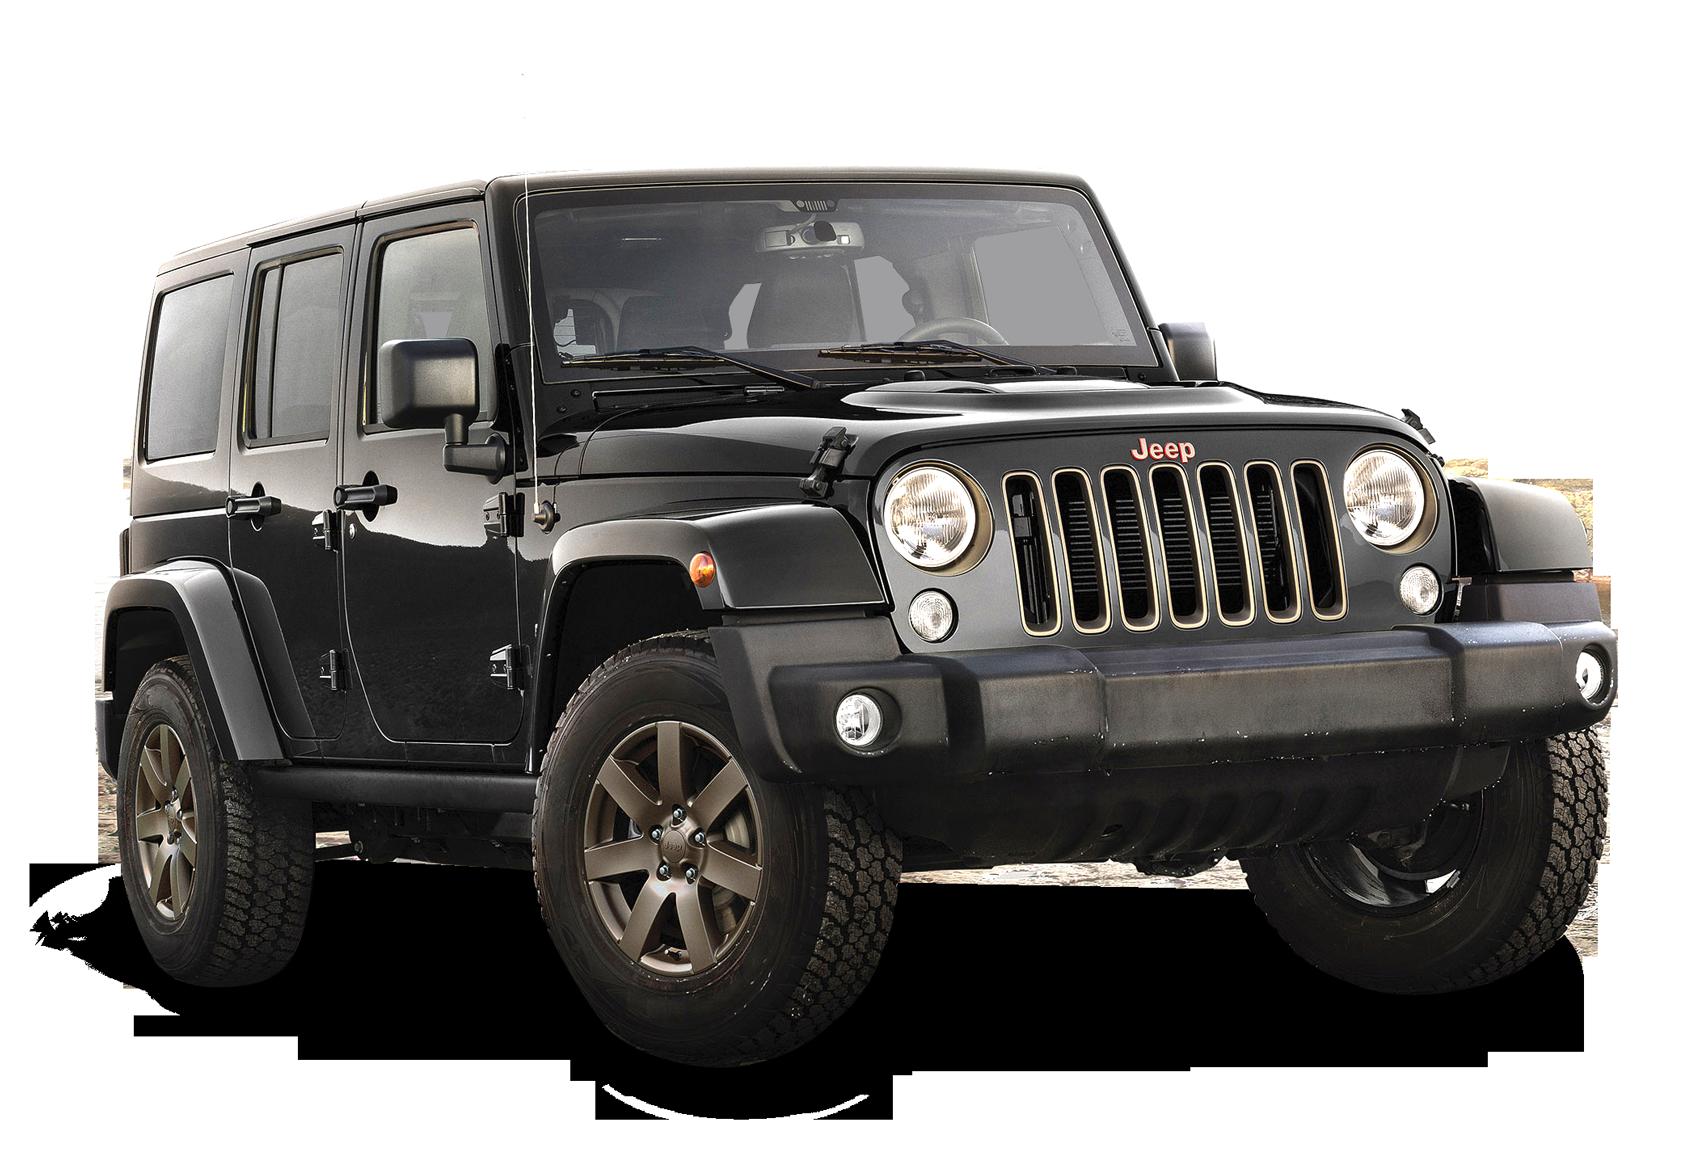 Black Jeep Wrangler Car Png Image Black Jeep Wrangler Wrangler Car Black Jeep